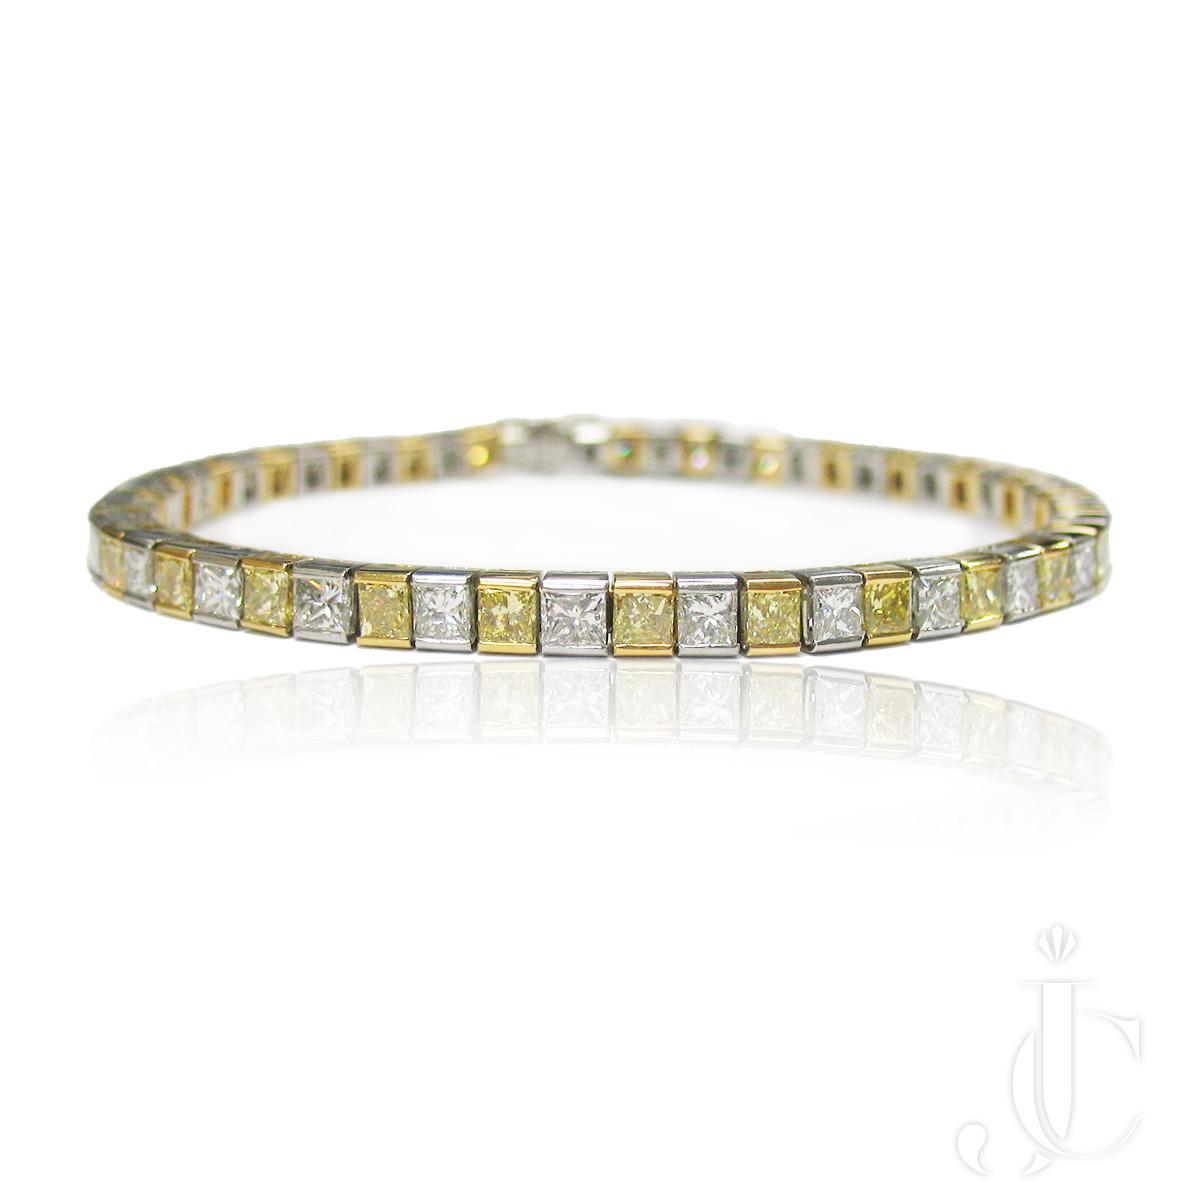 Princess cut Yellow and White Diamond Bracelet